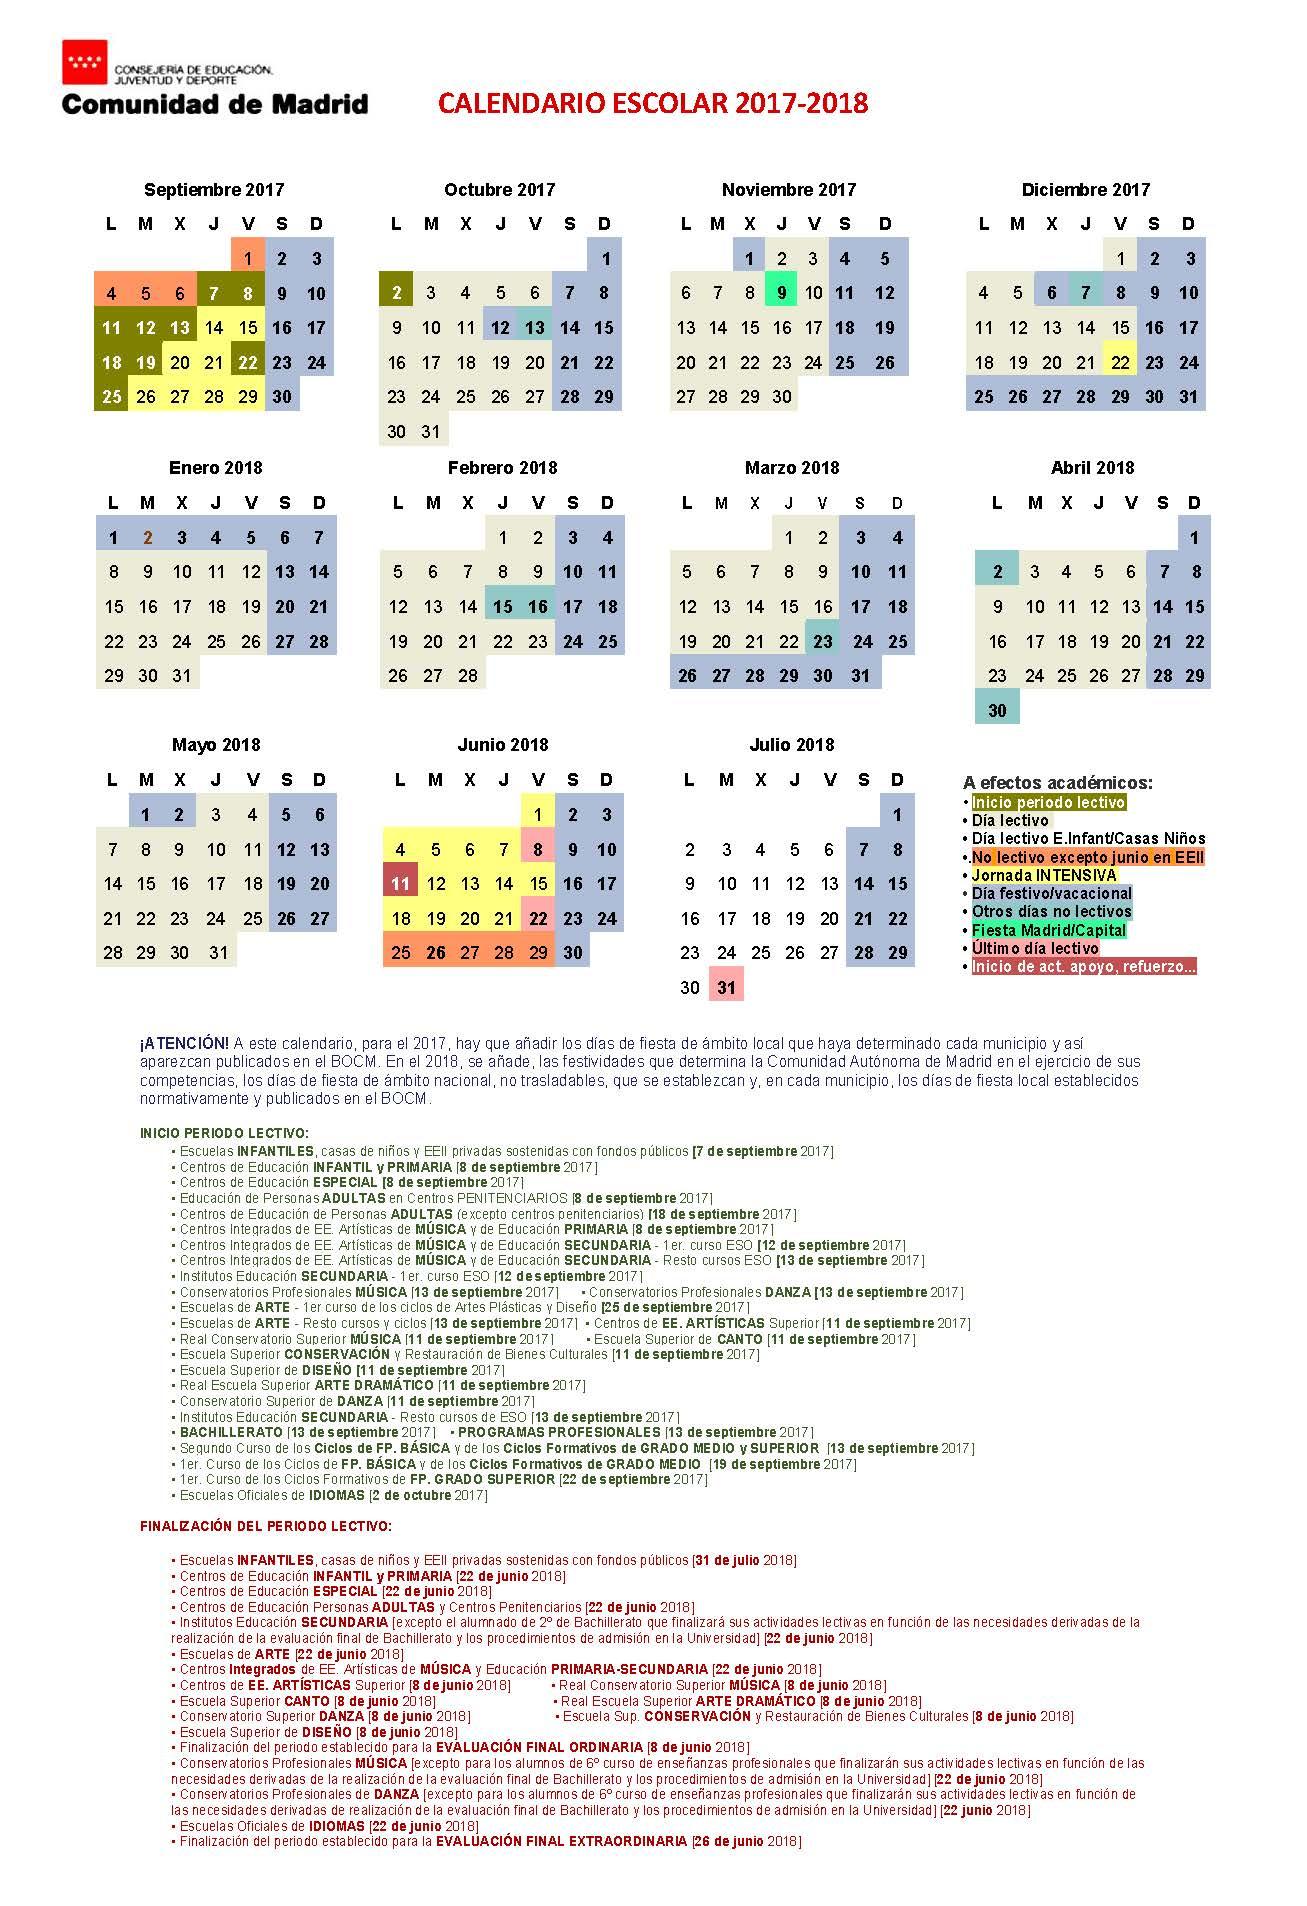 Calendario escolar cam 2016-2017